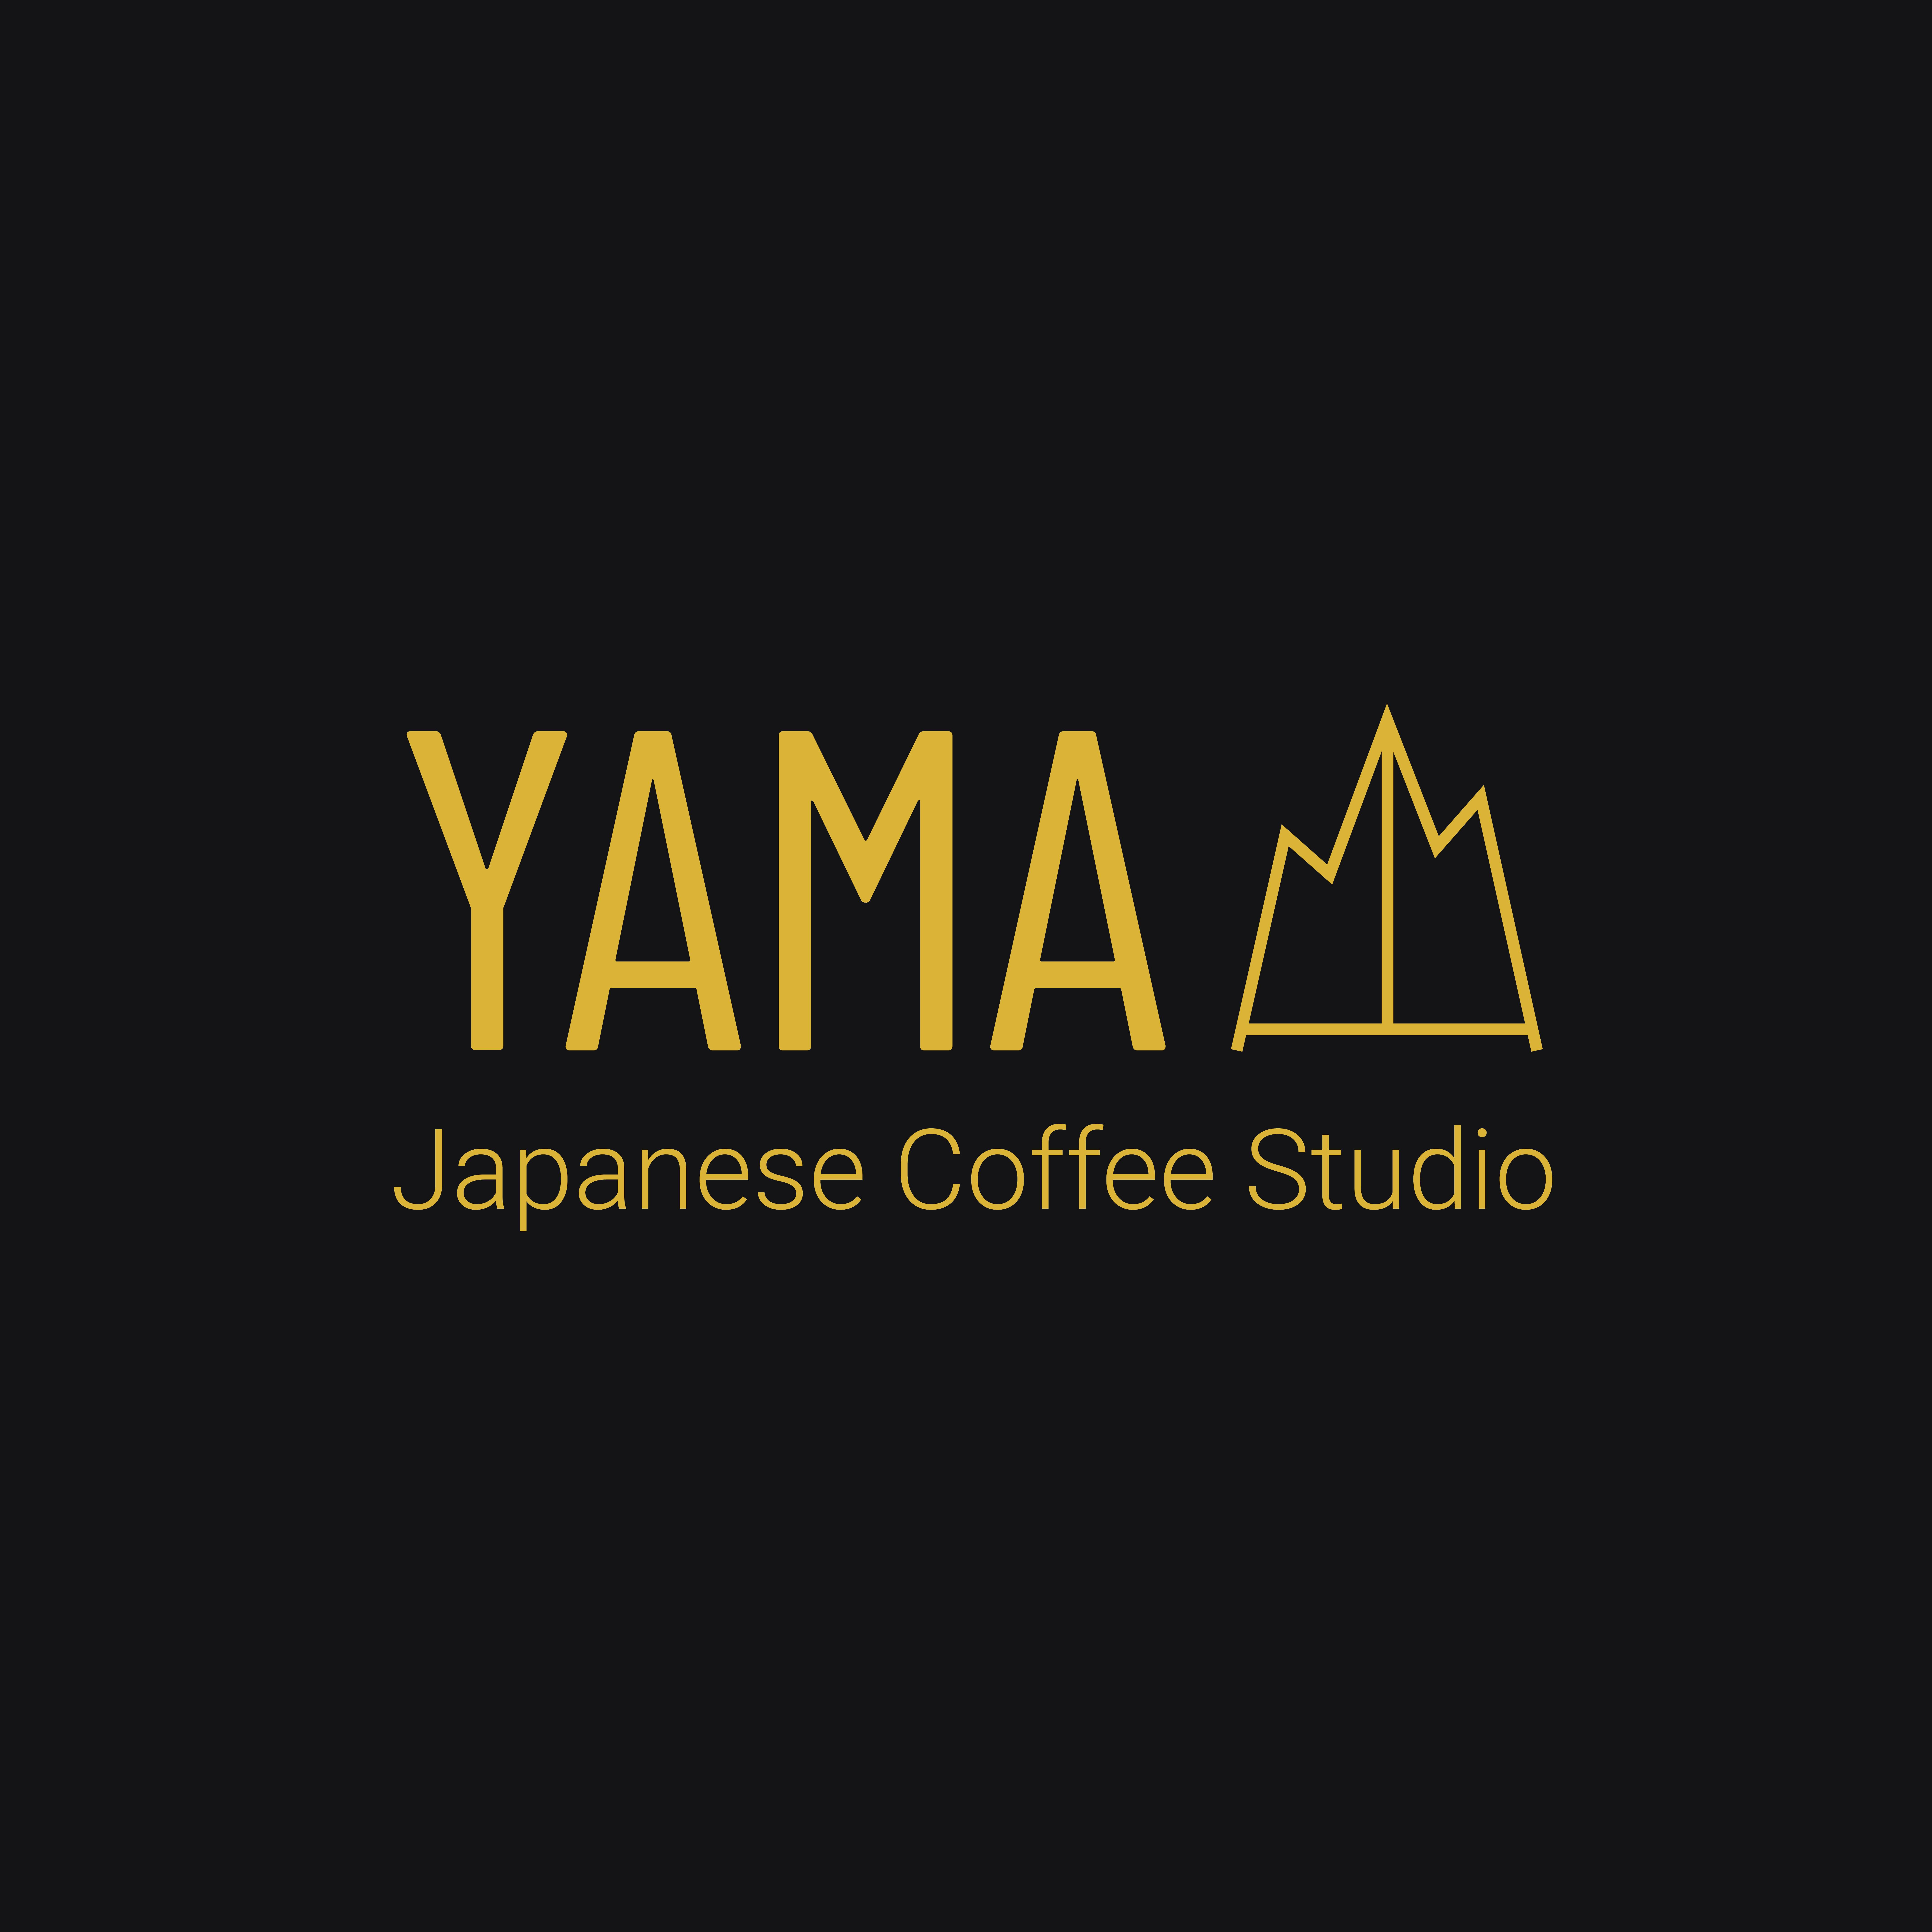 Yama Japanese Coffee Studio